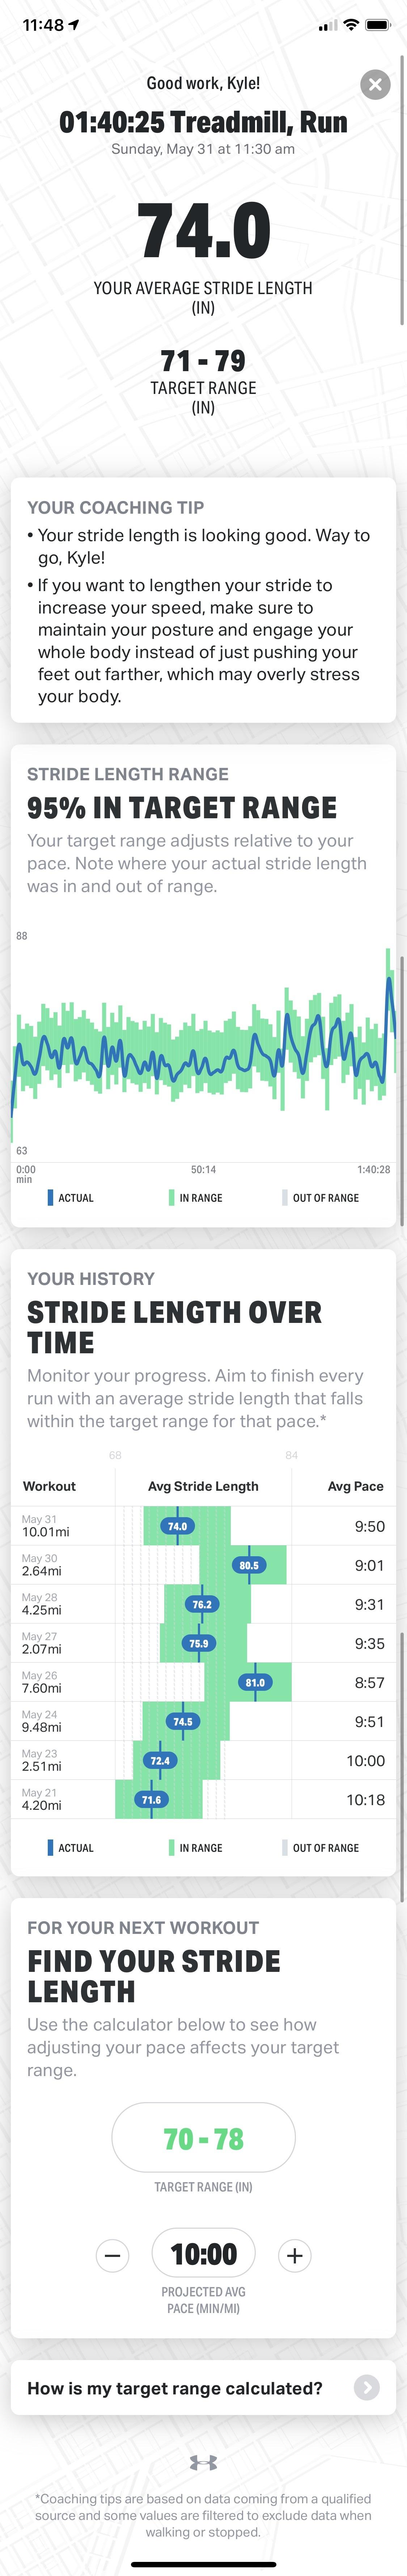 Stride_Length_coaching_.JPEG